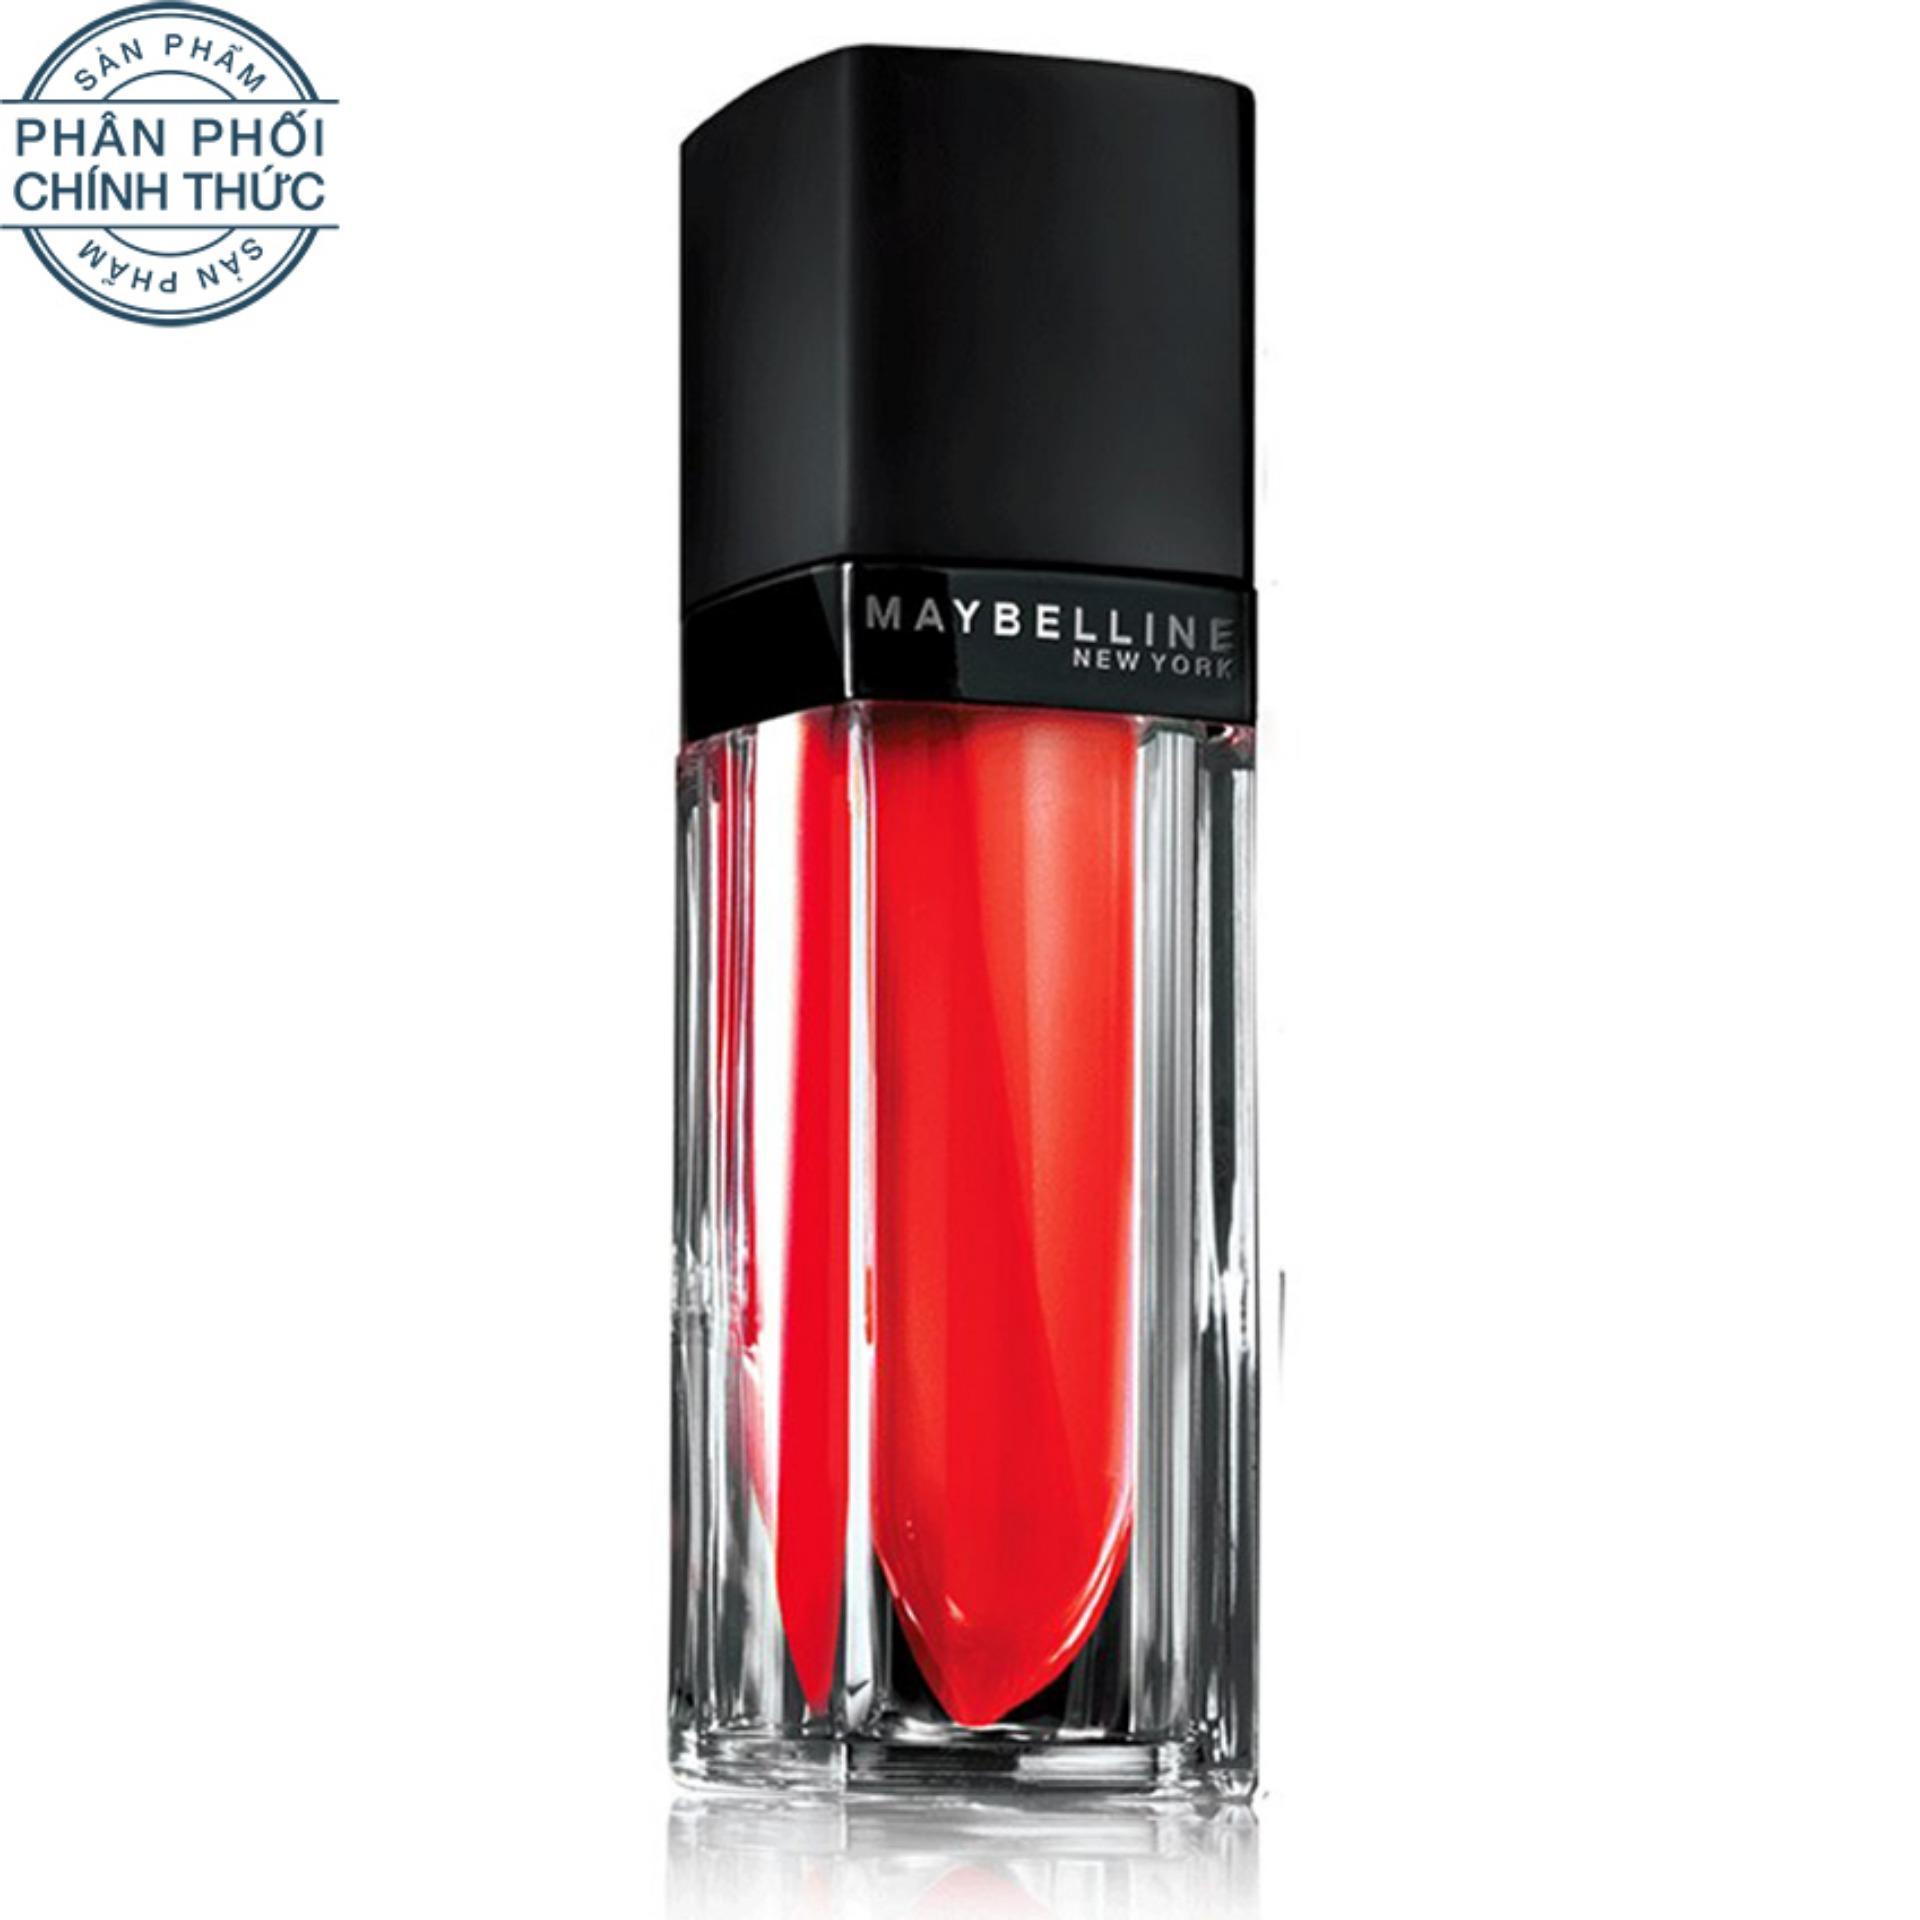 Mã Khuyến Mại Son Kem Li Maybelline Color Vivid Matte Liquid Mat8 5Ml Đỏ Rực